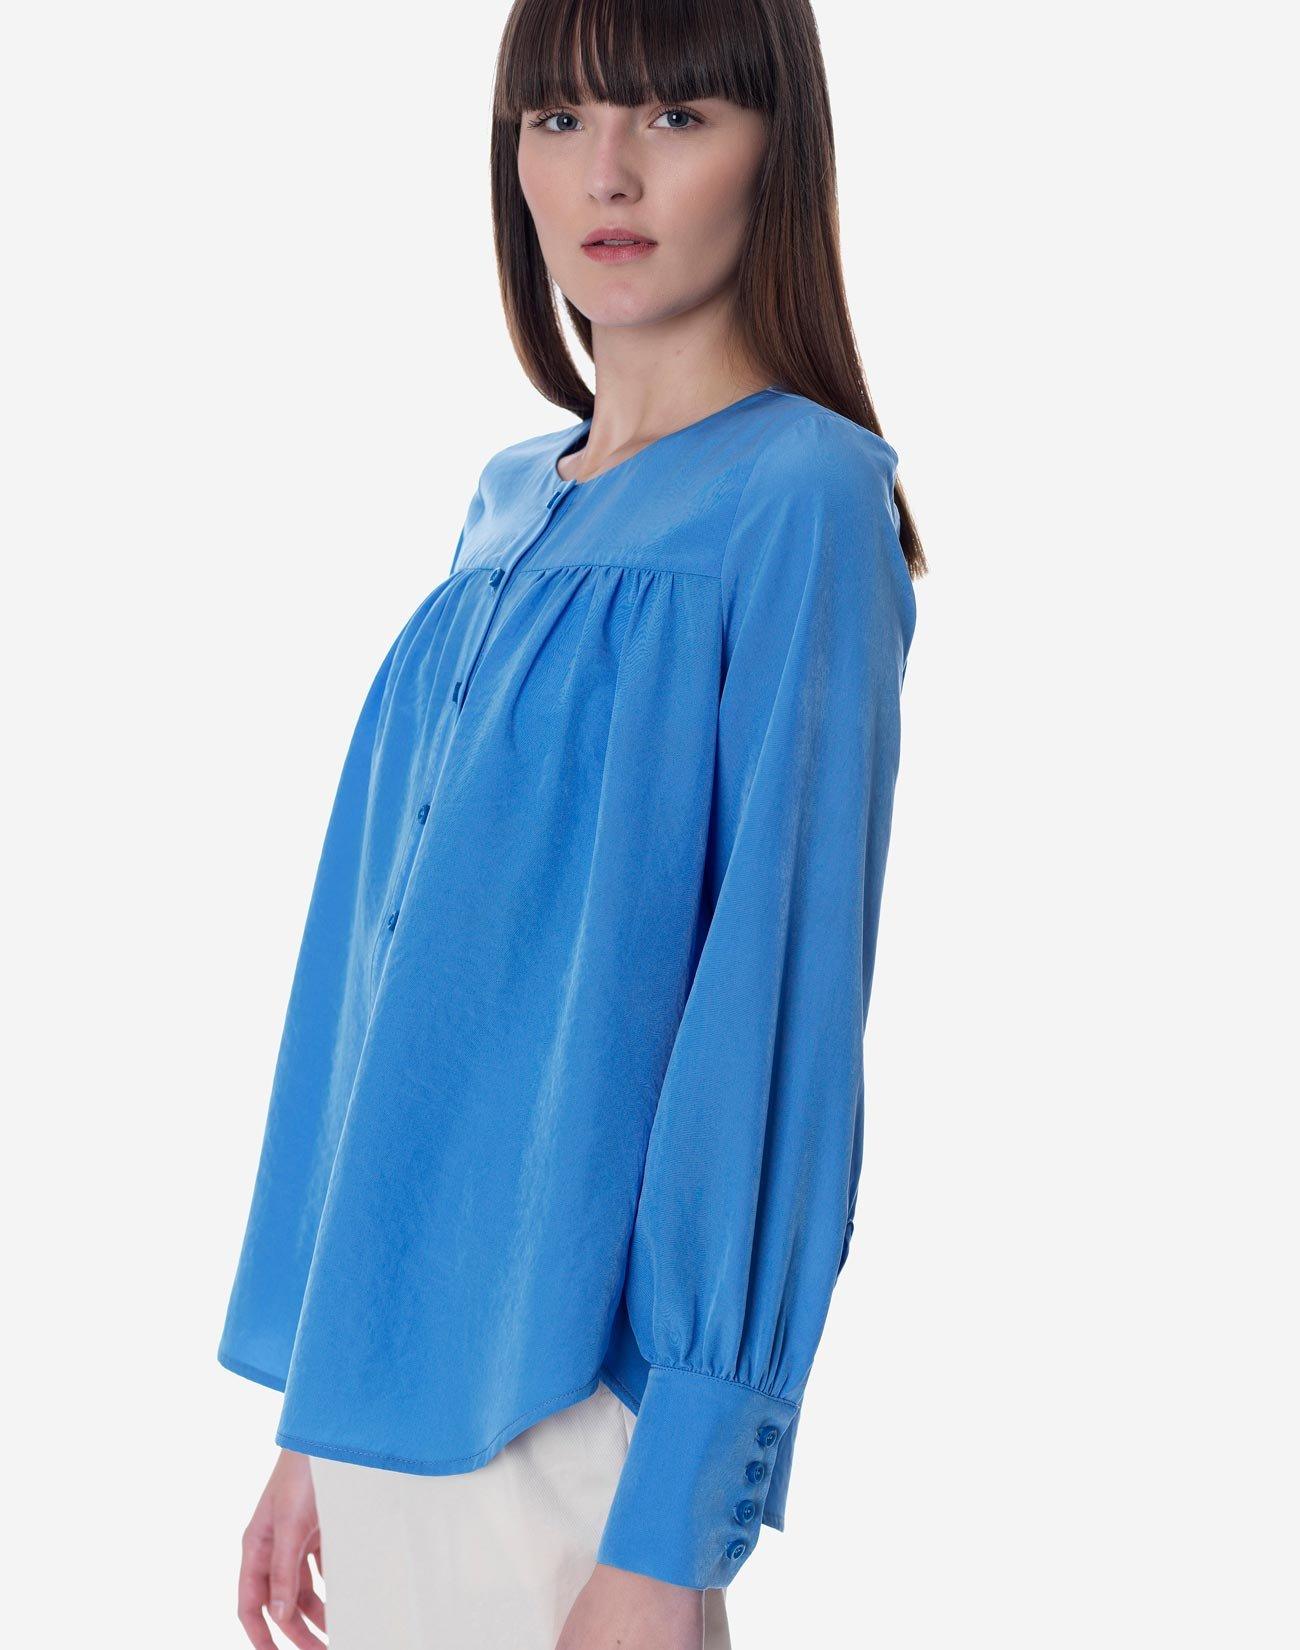 Pleated shirt